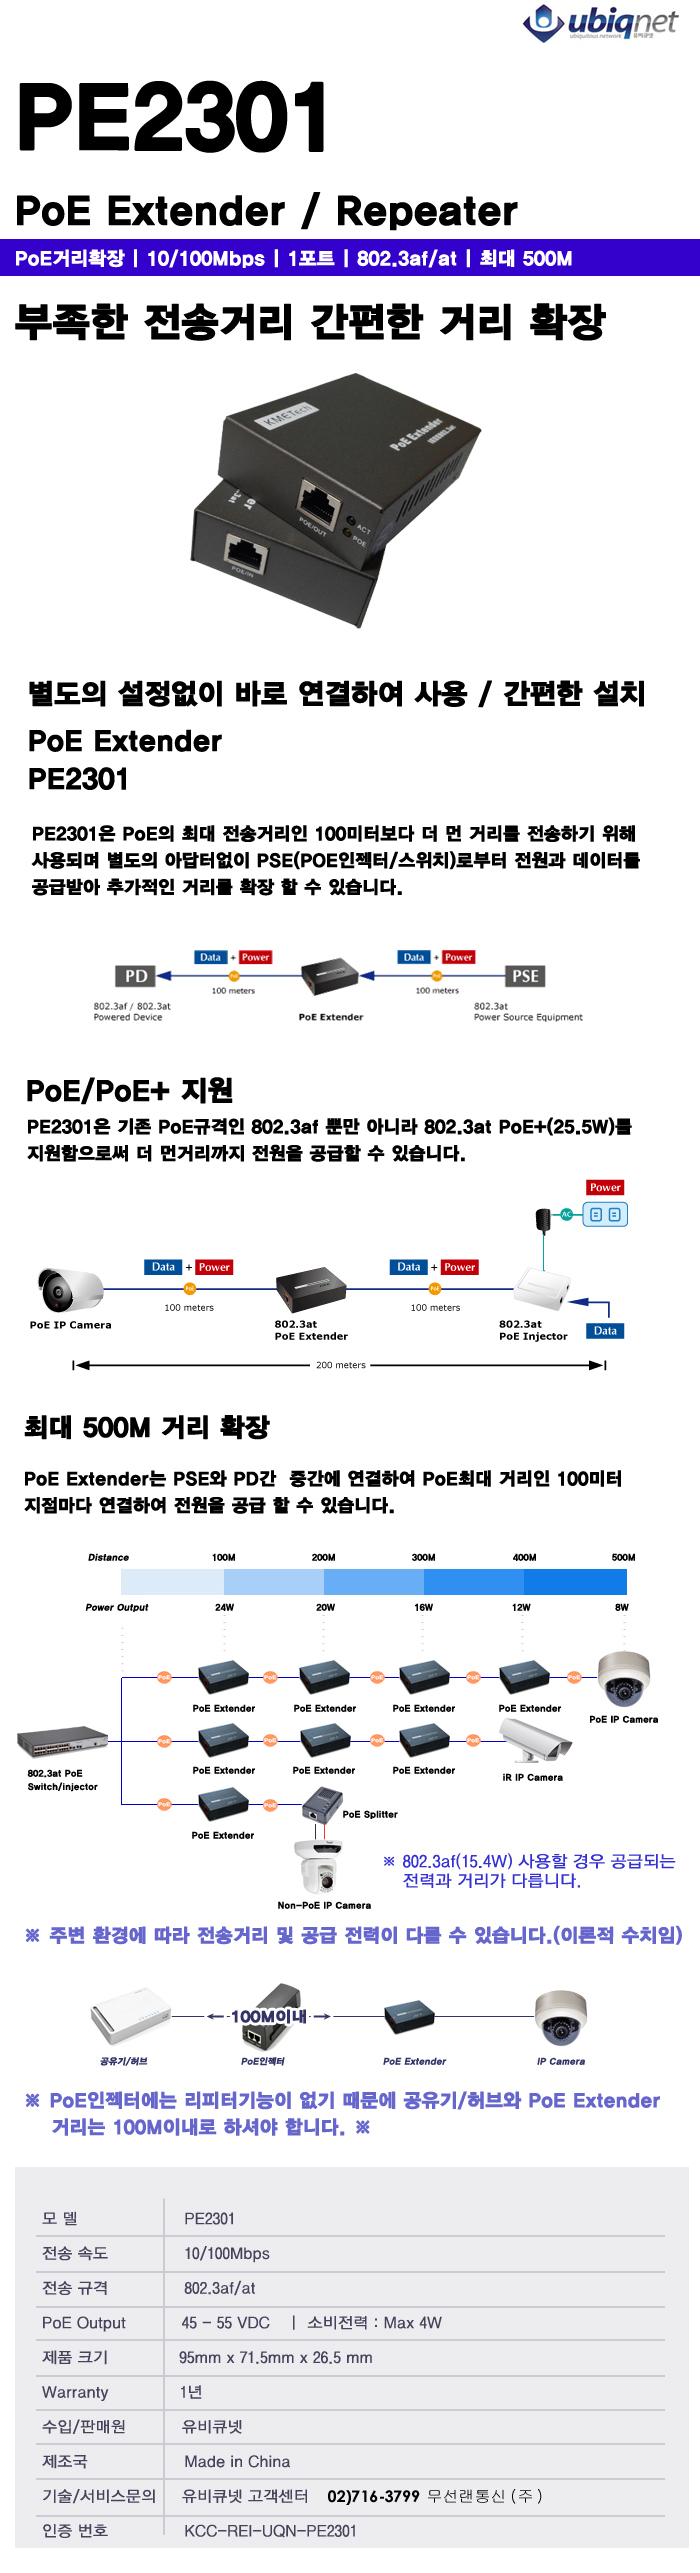 PE-2301 POE Extender